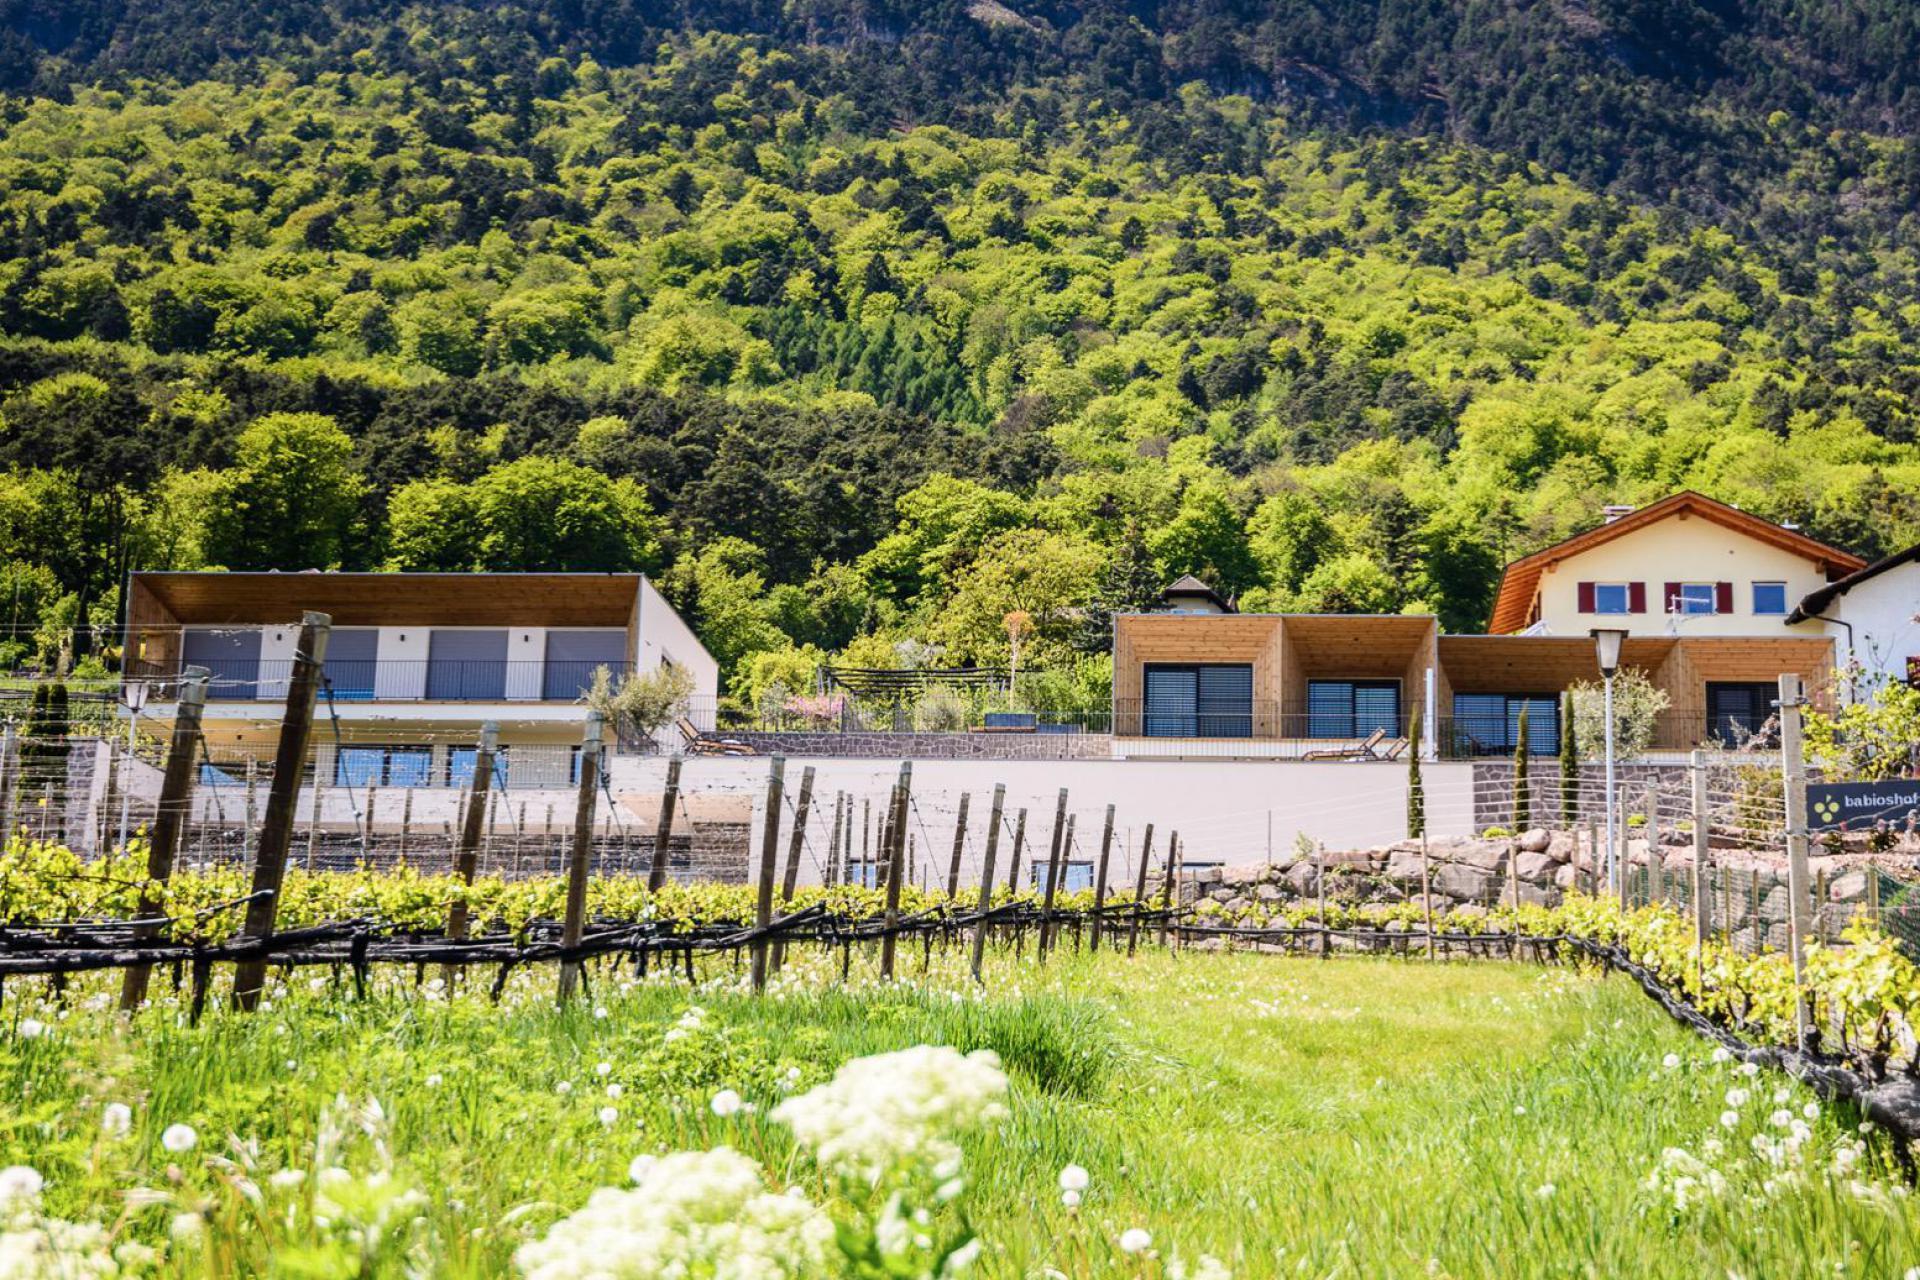 Agriturismo Dolomites Charming agriturismo between apple trees and vineyards